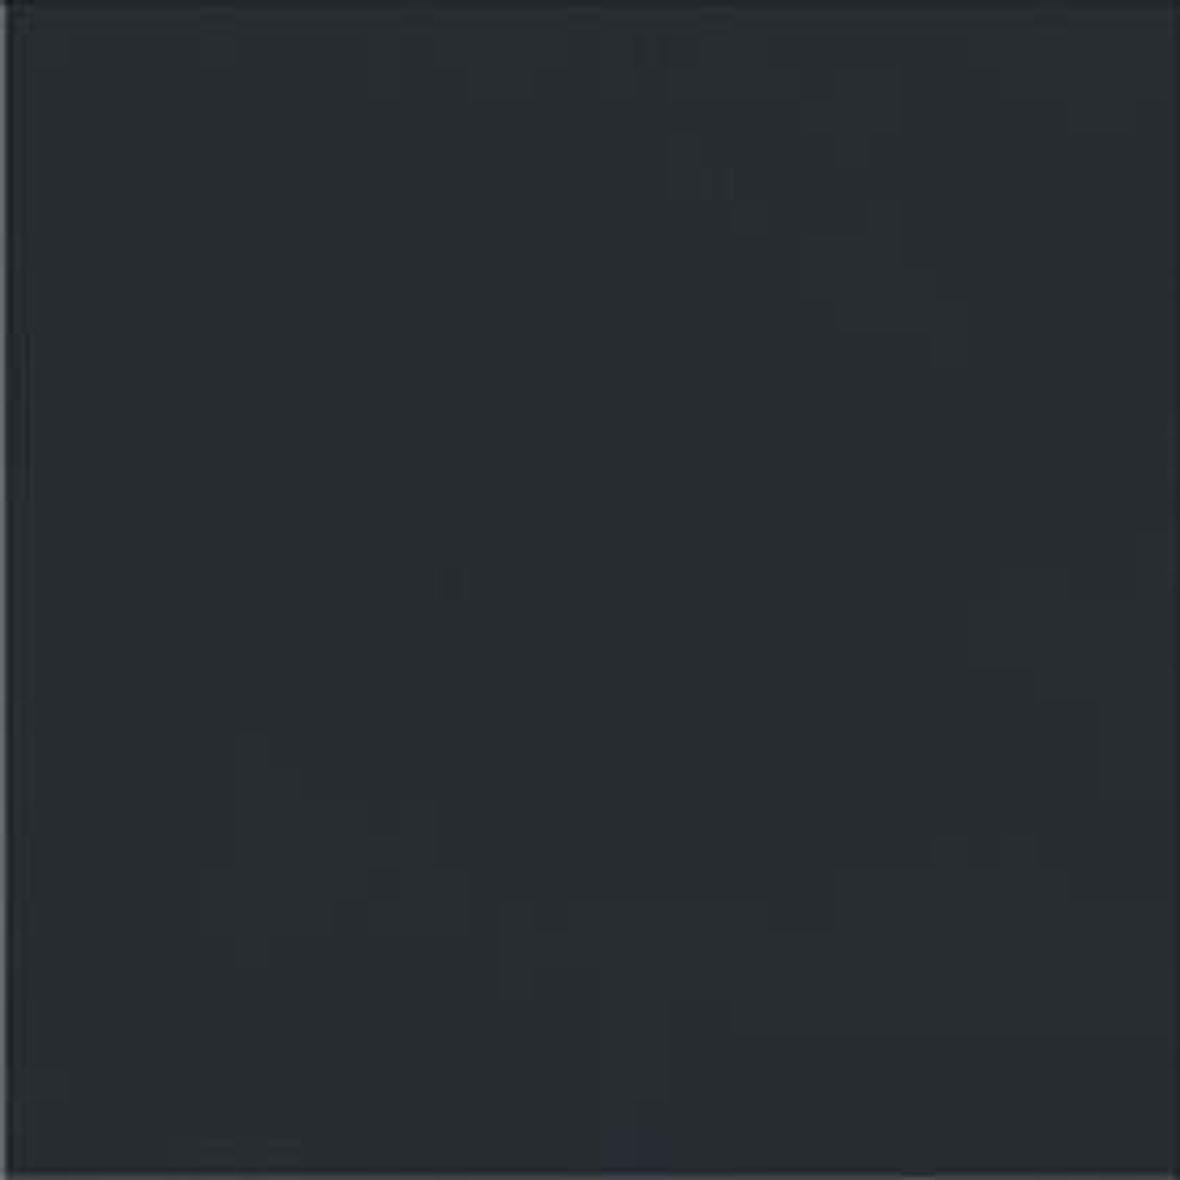 MONOBLOCK BLACK MATT 20X20 G1